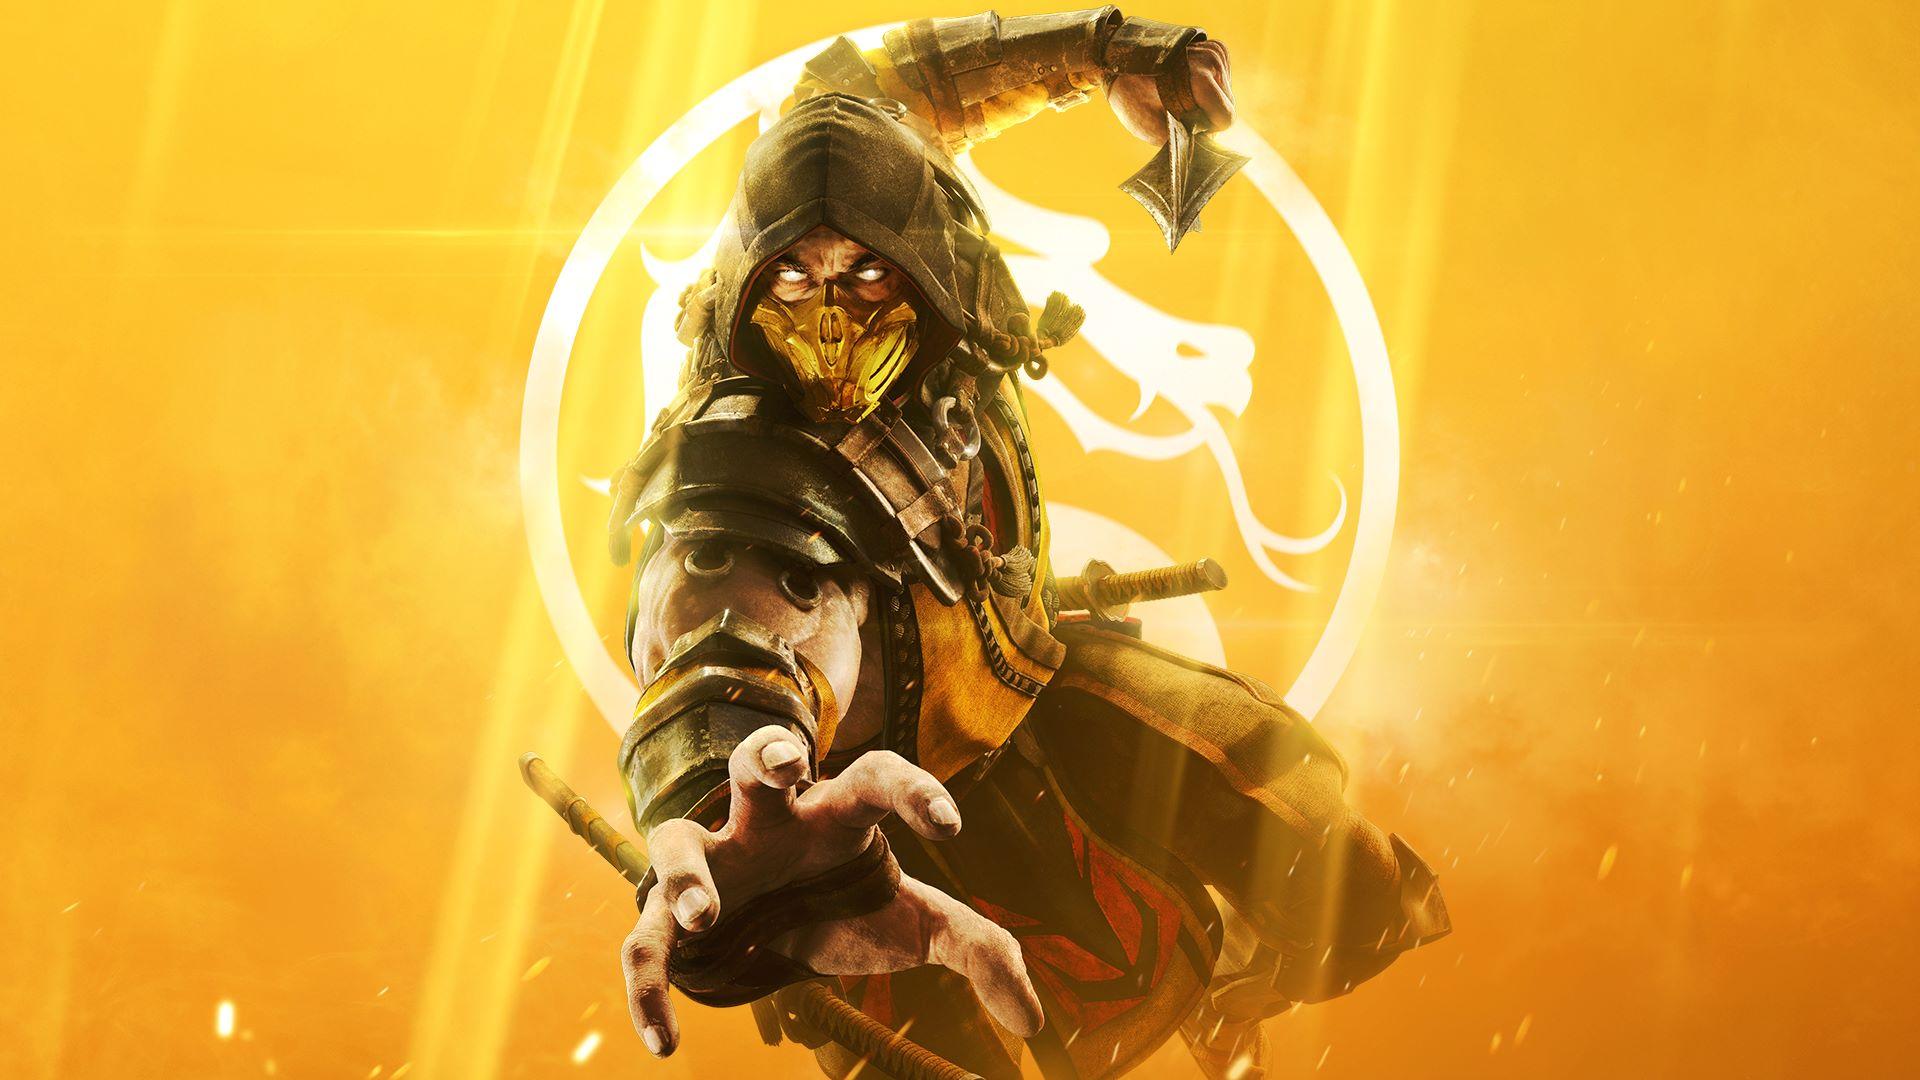 You gotta pre-order Mortal Kombat 11 to get into the closed beta screenshot